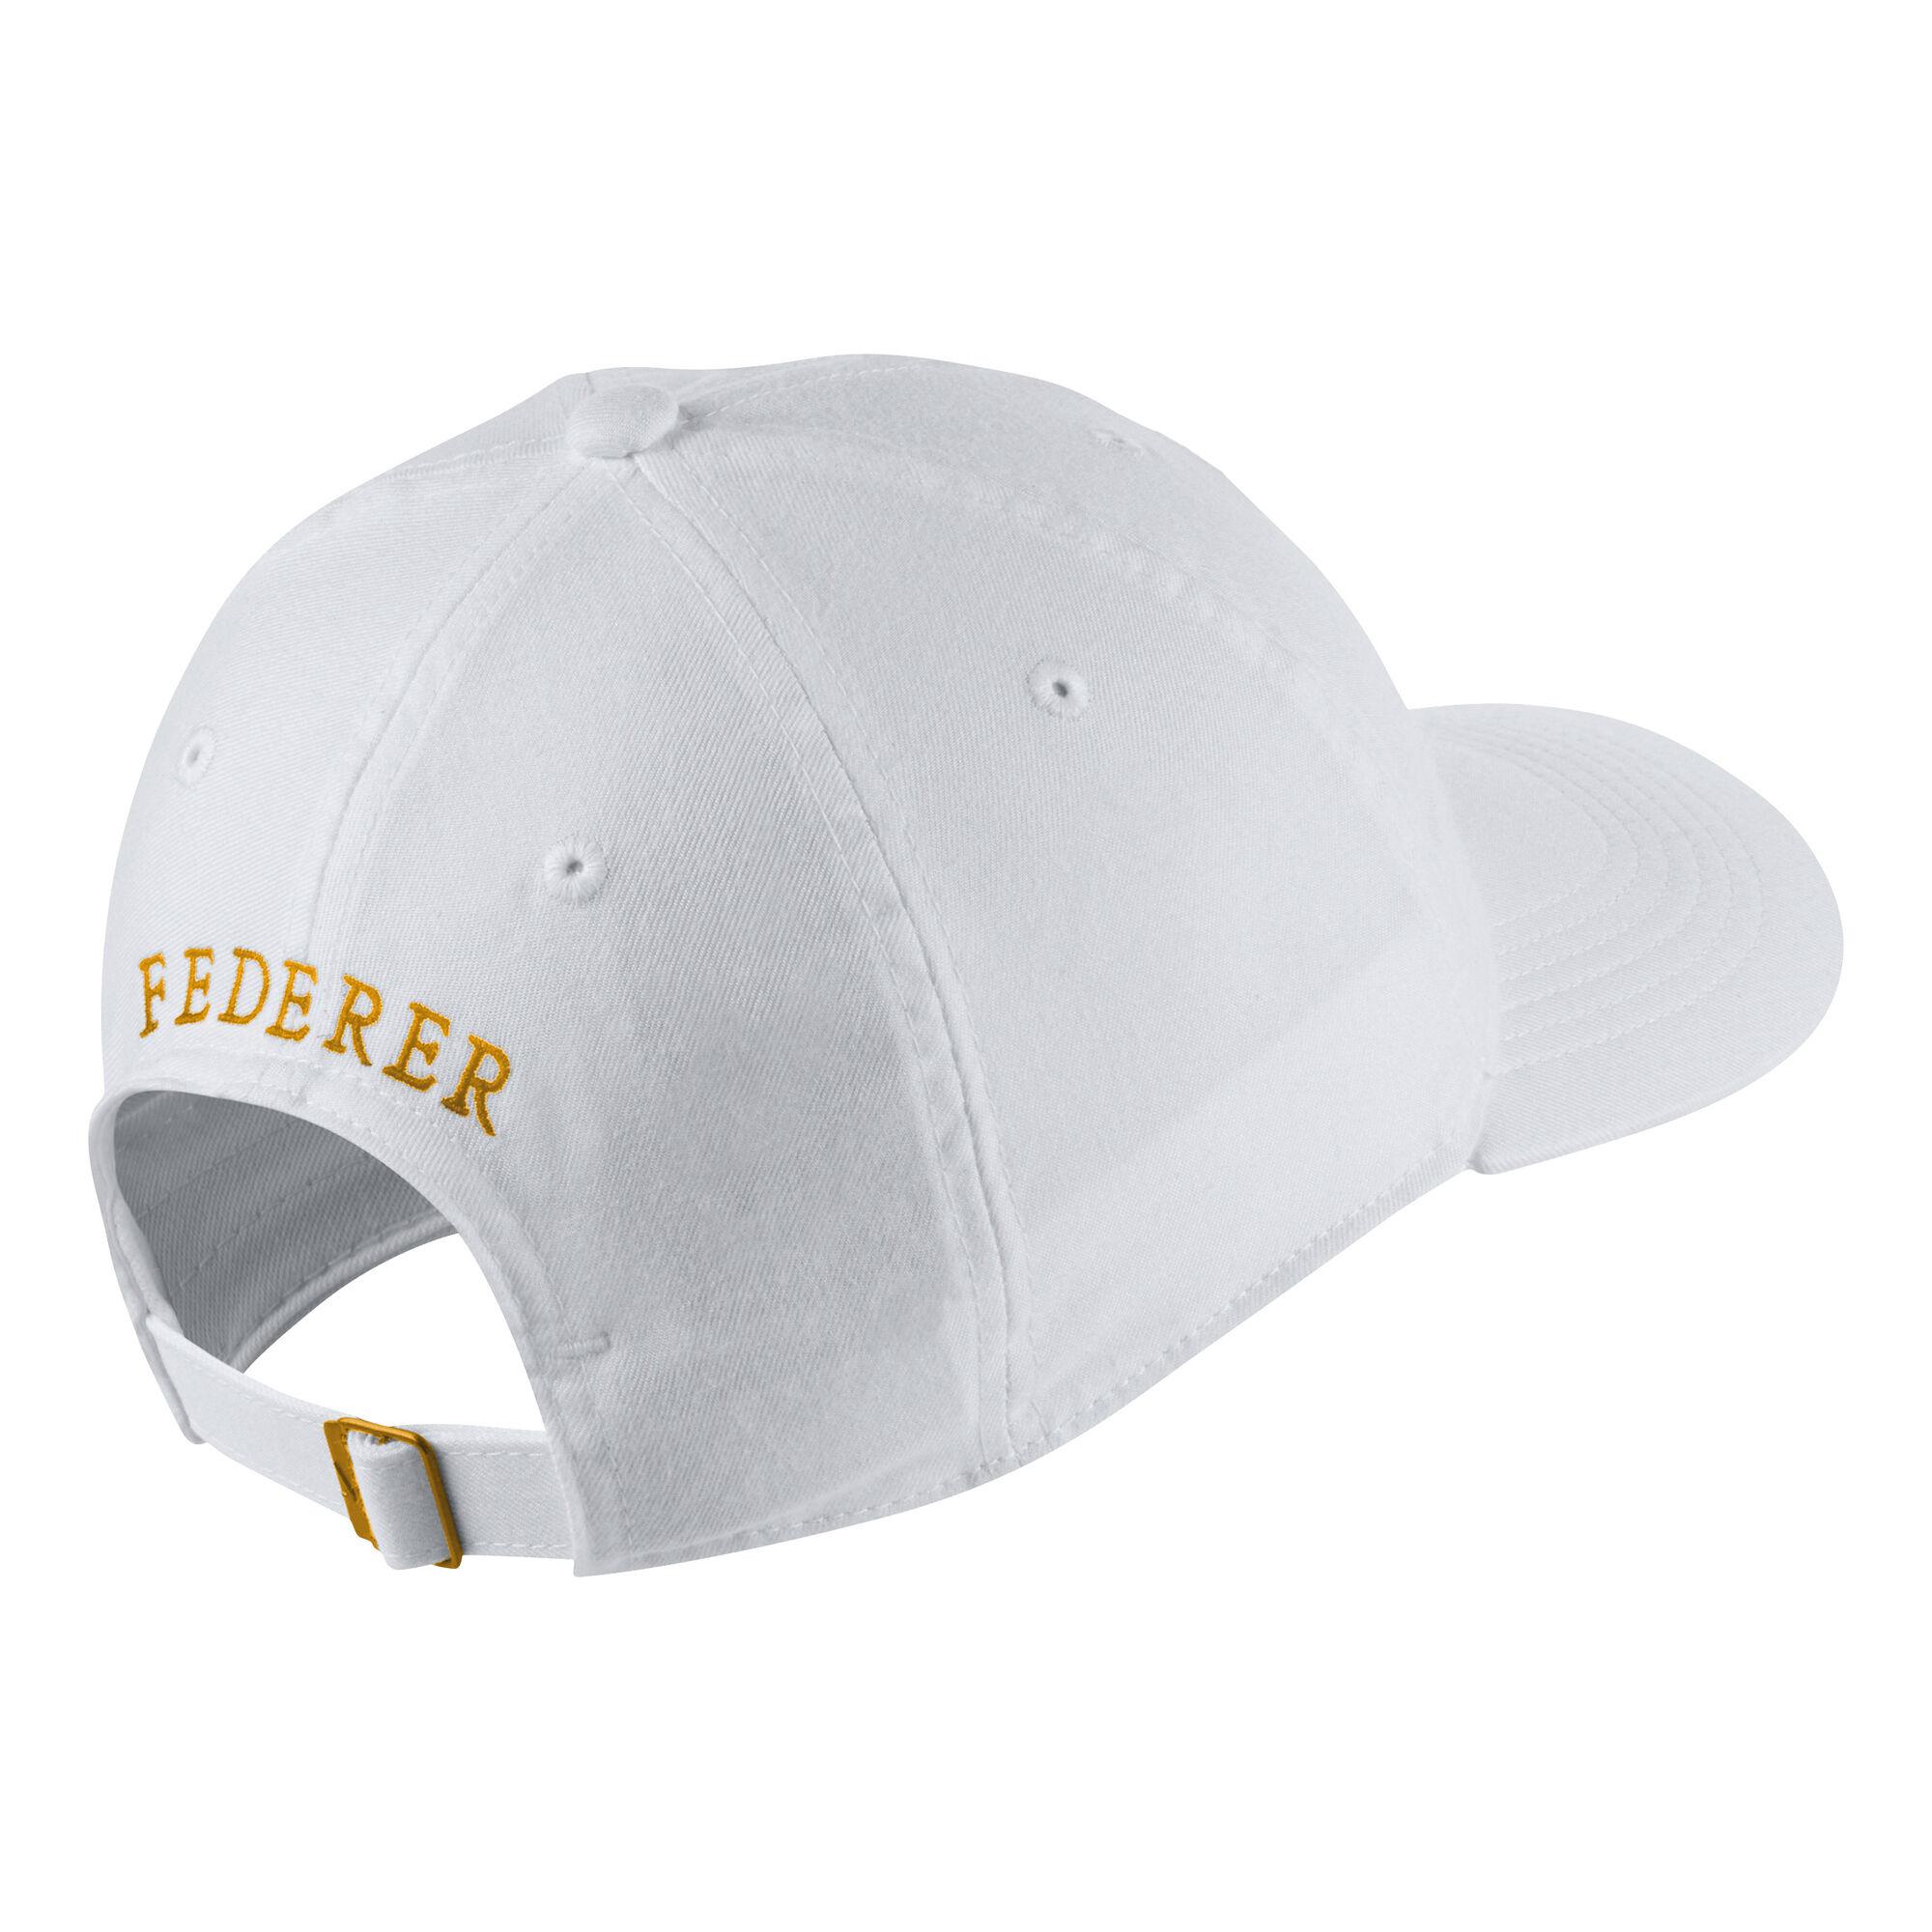 Nike Roger Federer 20th Celebration Cap - Weiß, Gold online kaufen